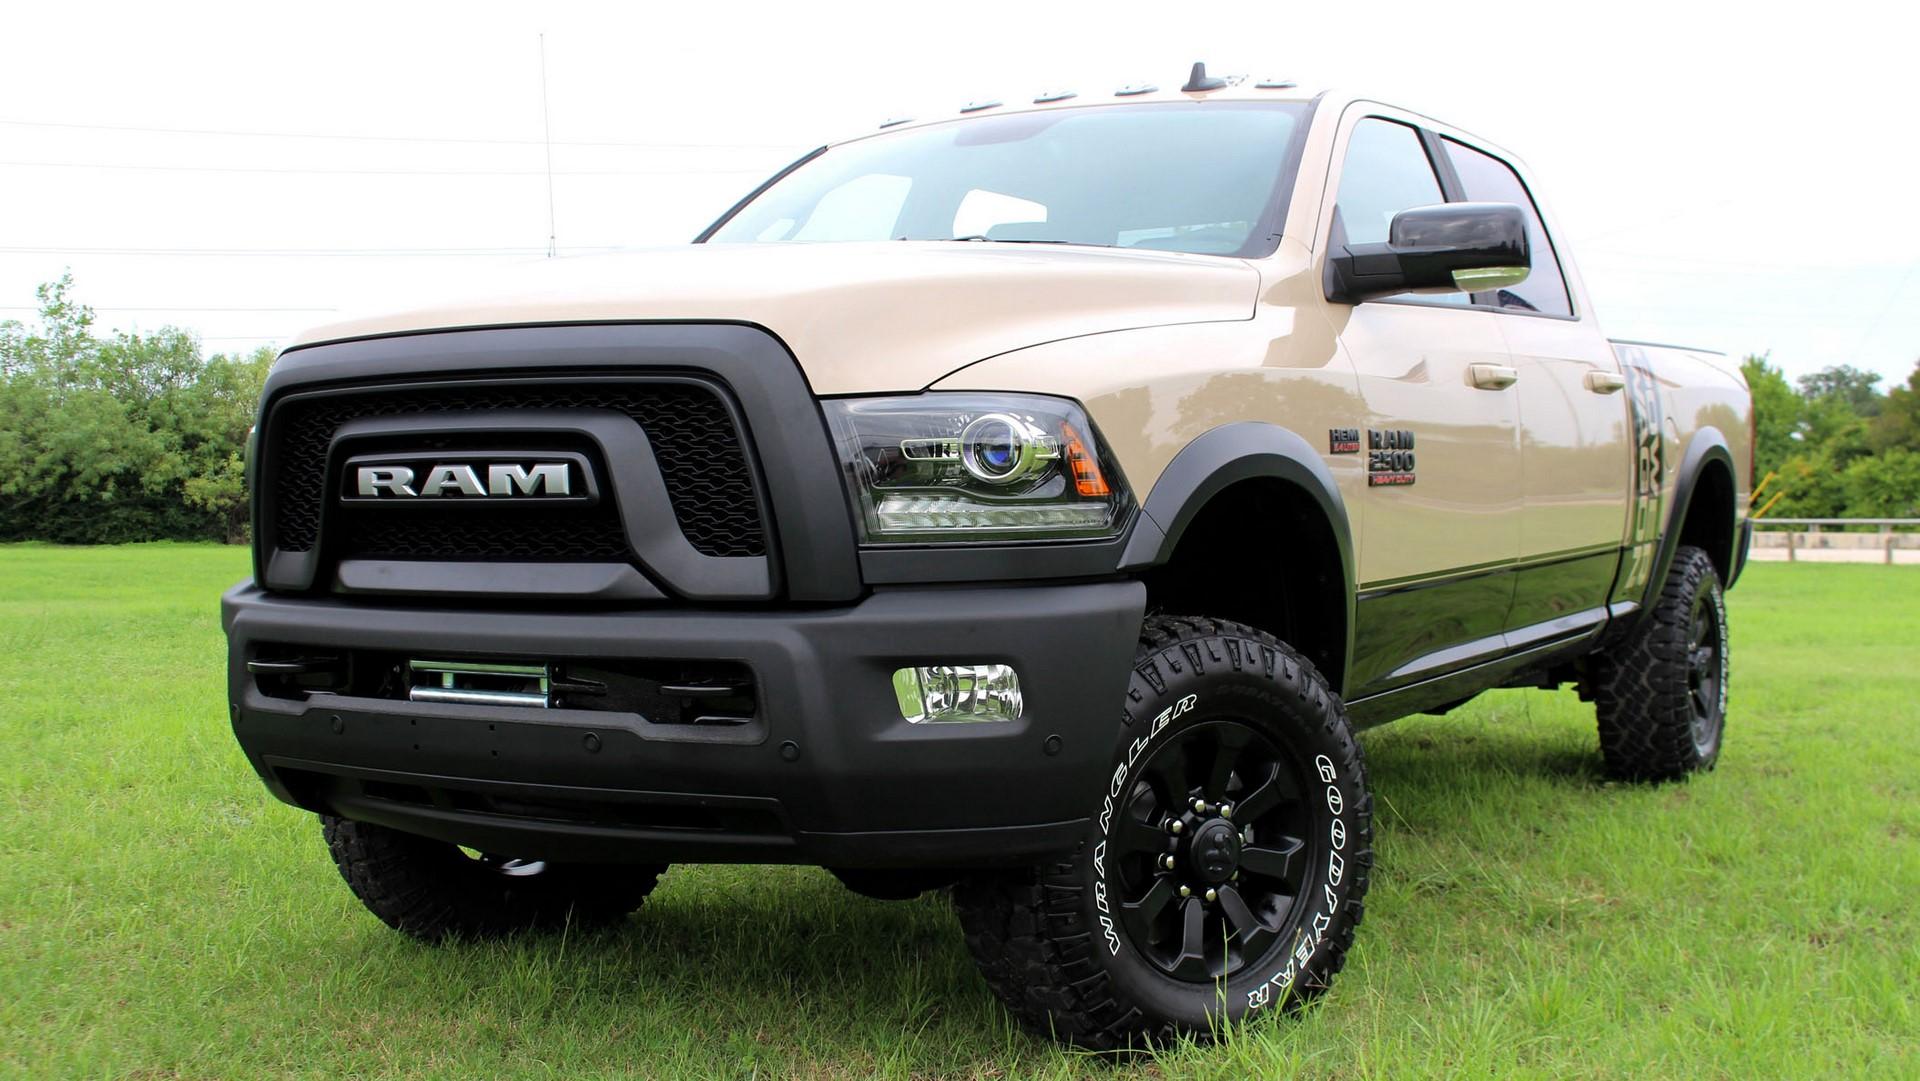 ram-2500-powerwagon-front-corner-1-1